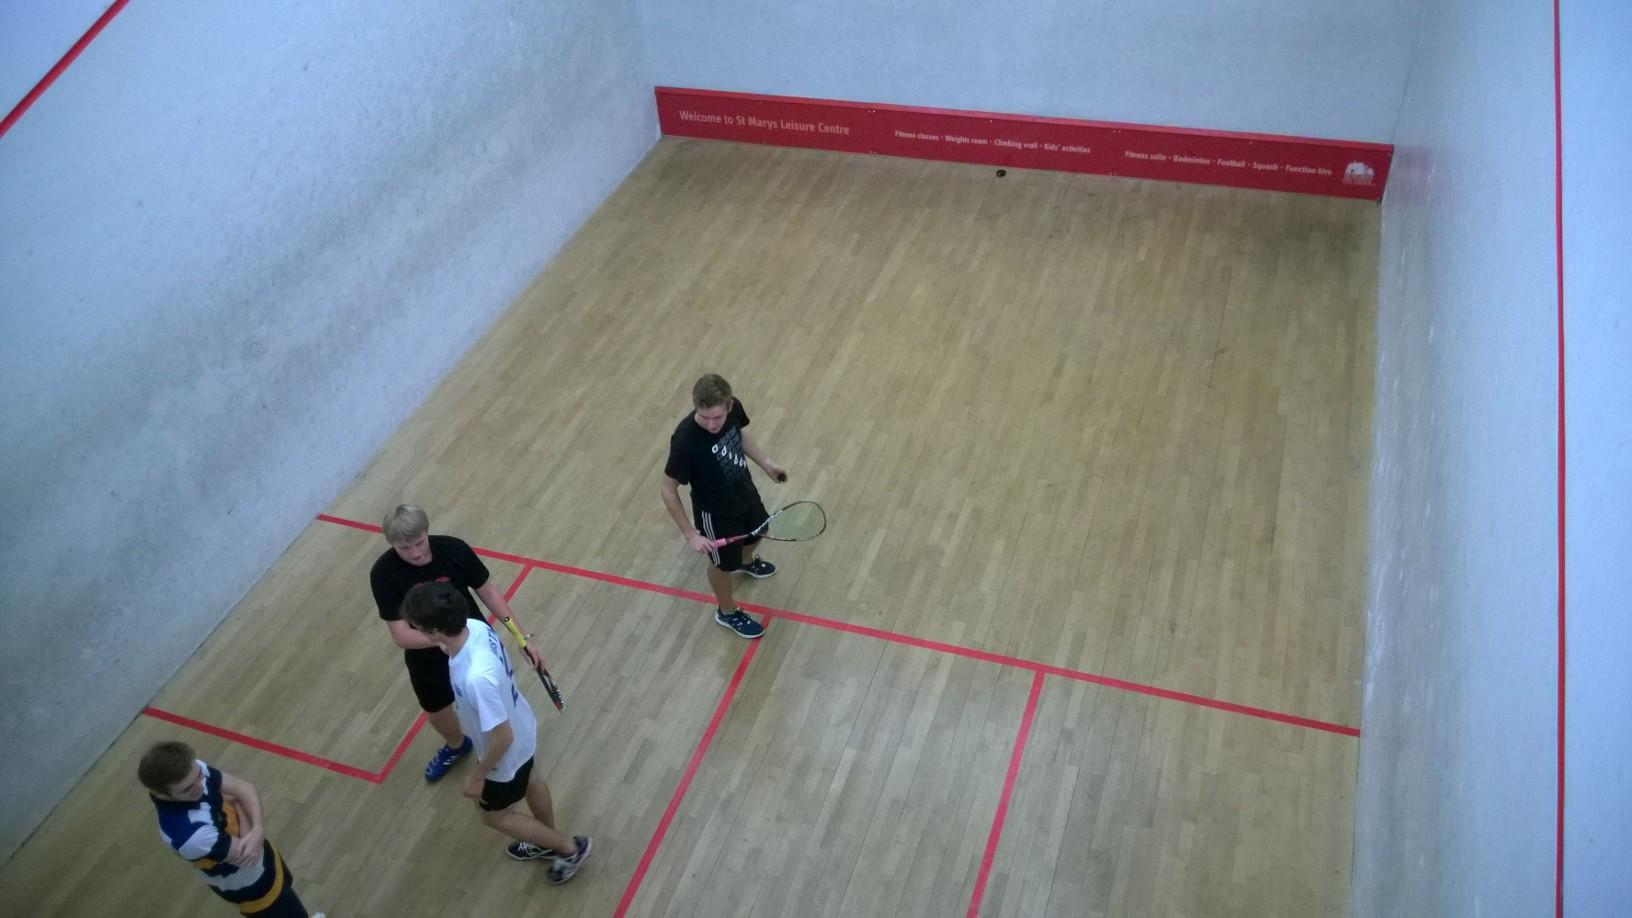 Solent squash team saved by trio of senior members